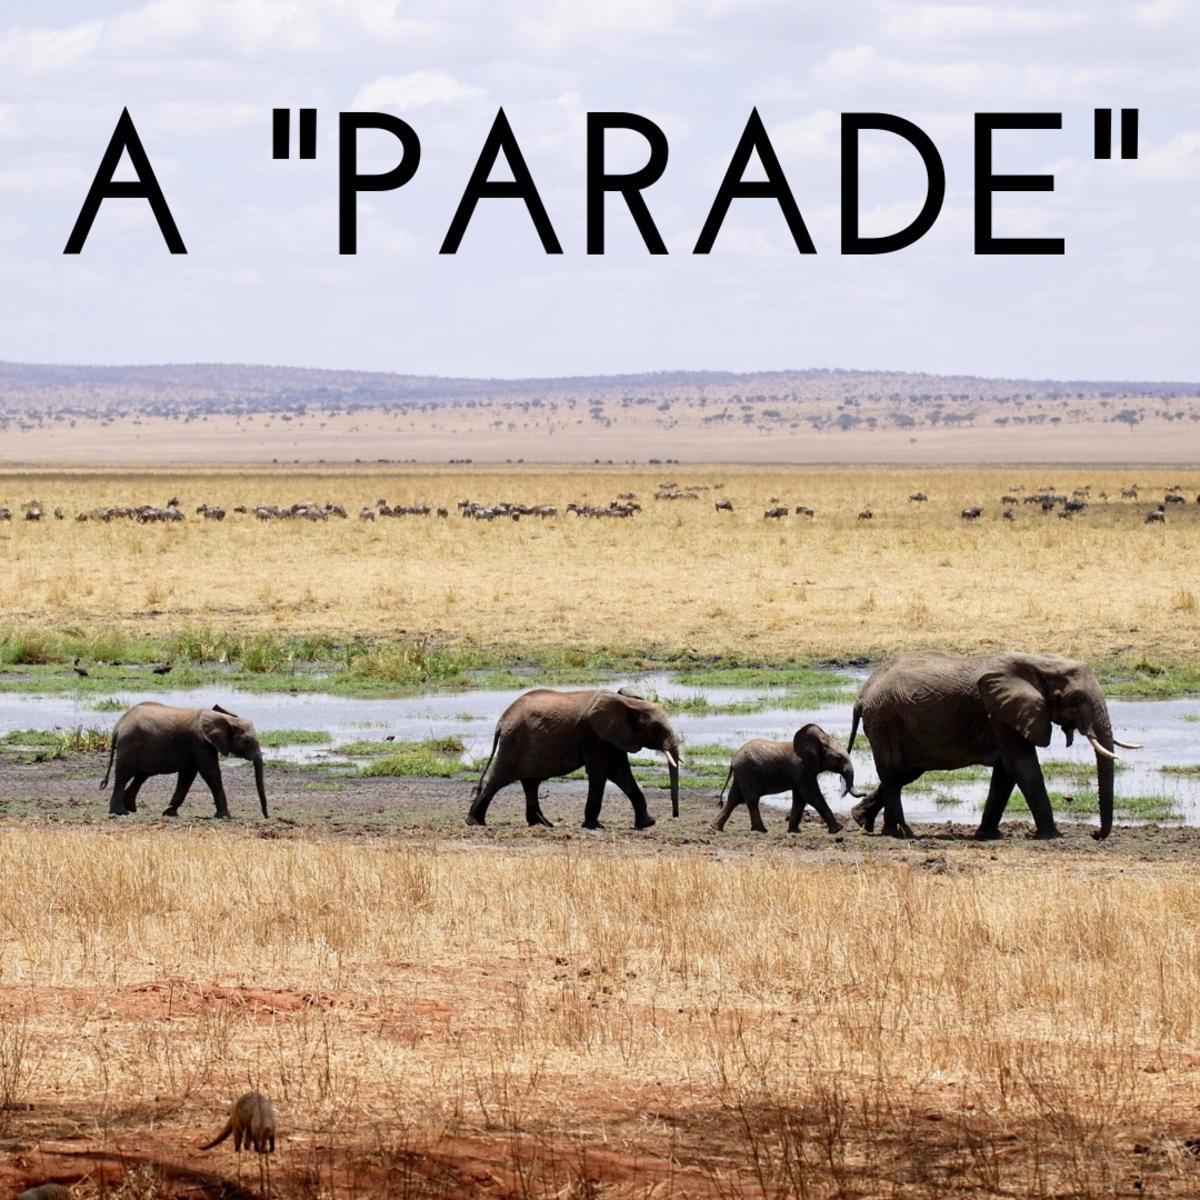 A parade of elephants.